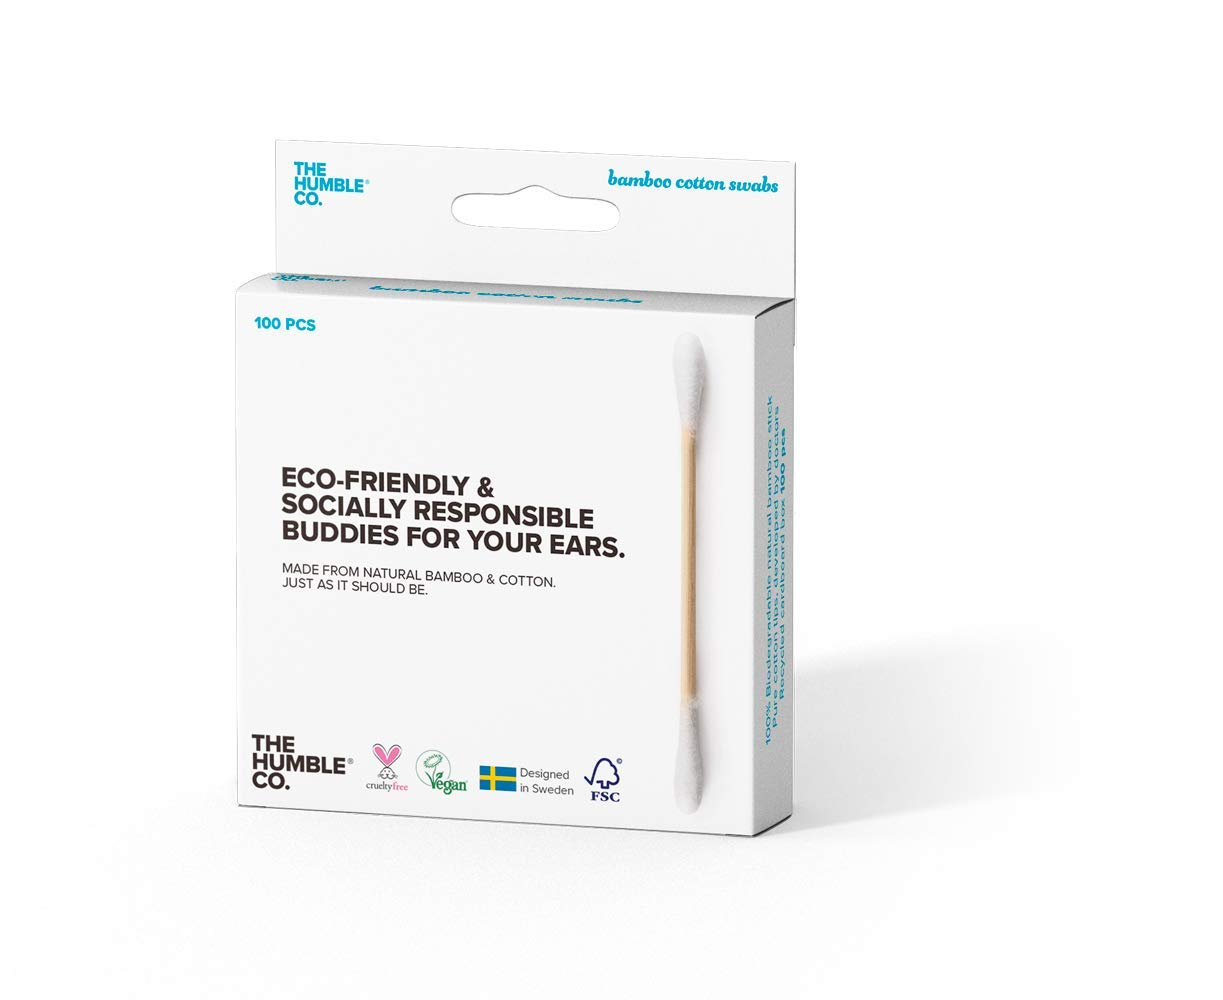 Humble Natural Bamboo Cotton Swab - White - 5 Pack a 100 pcs.